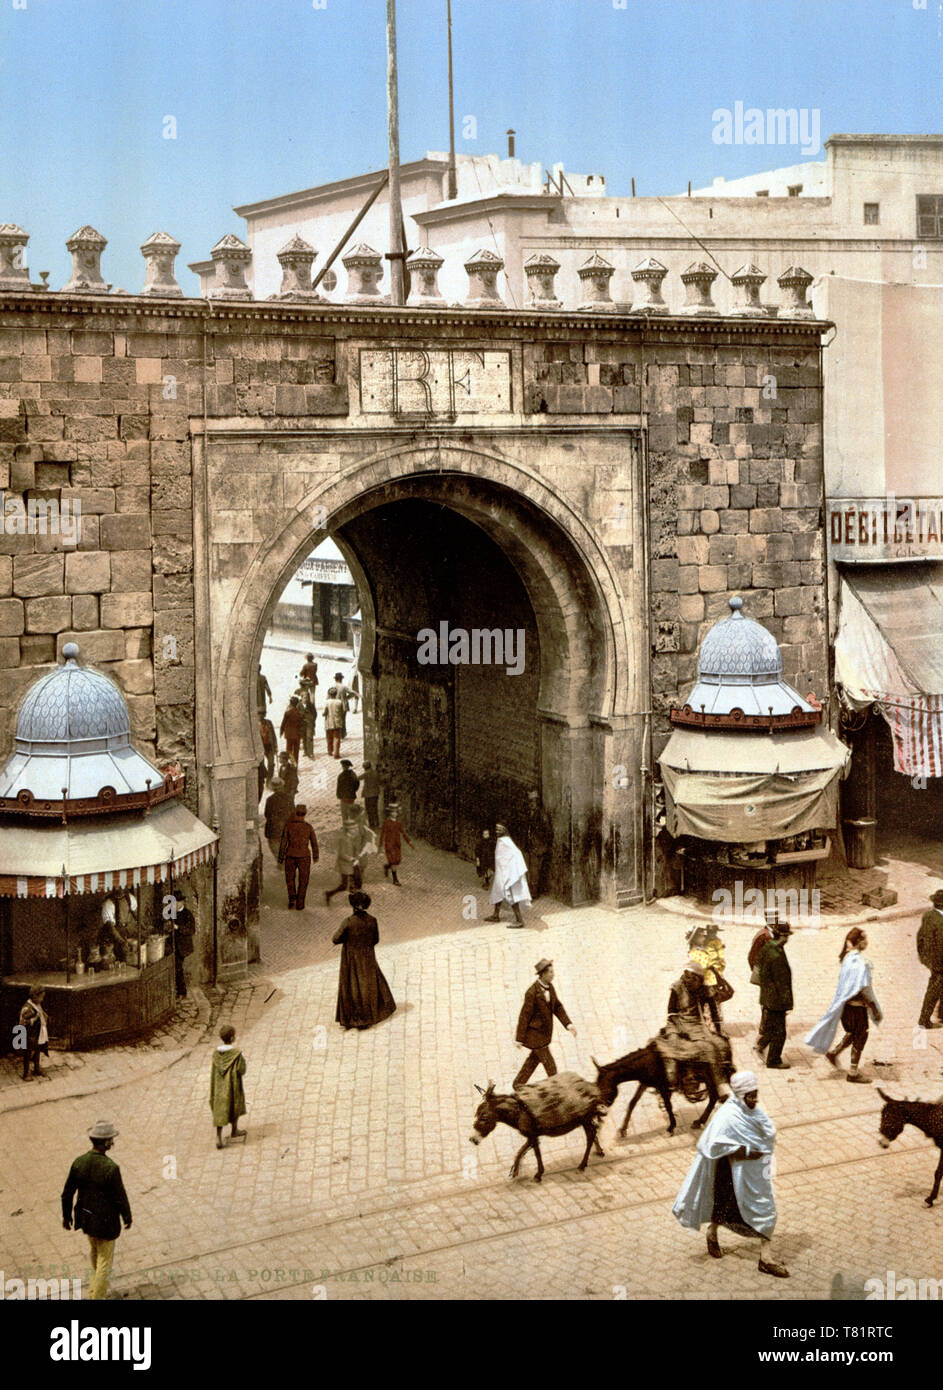 Tunis, Bab el Bhar, 1899 Stock Photo